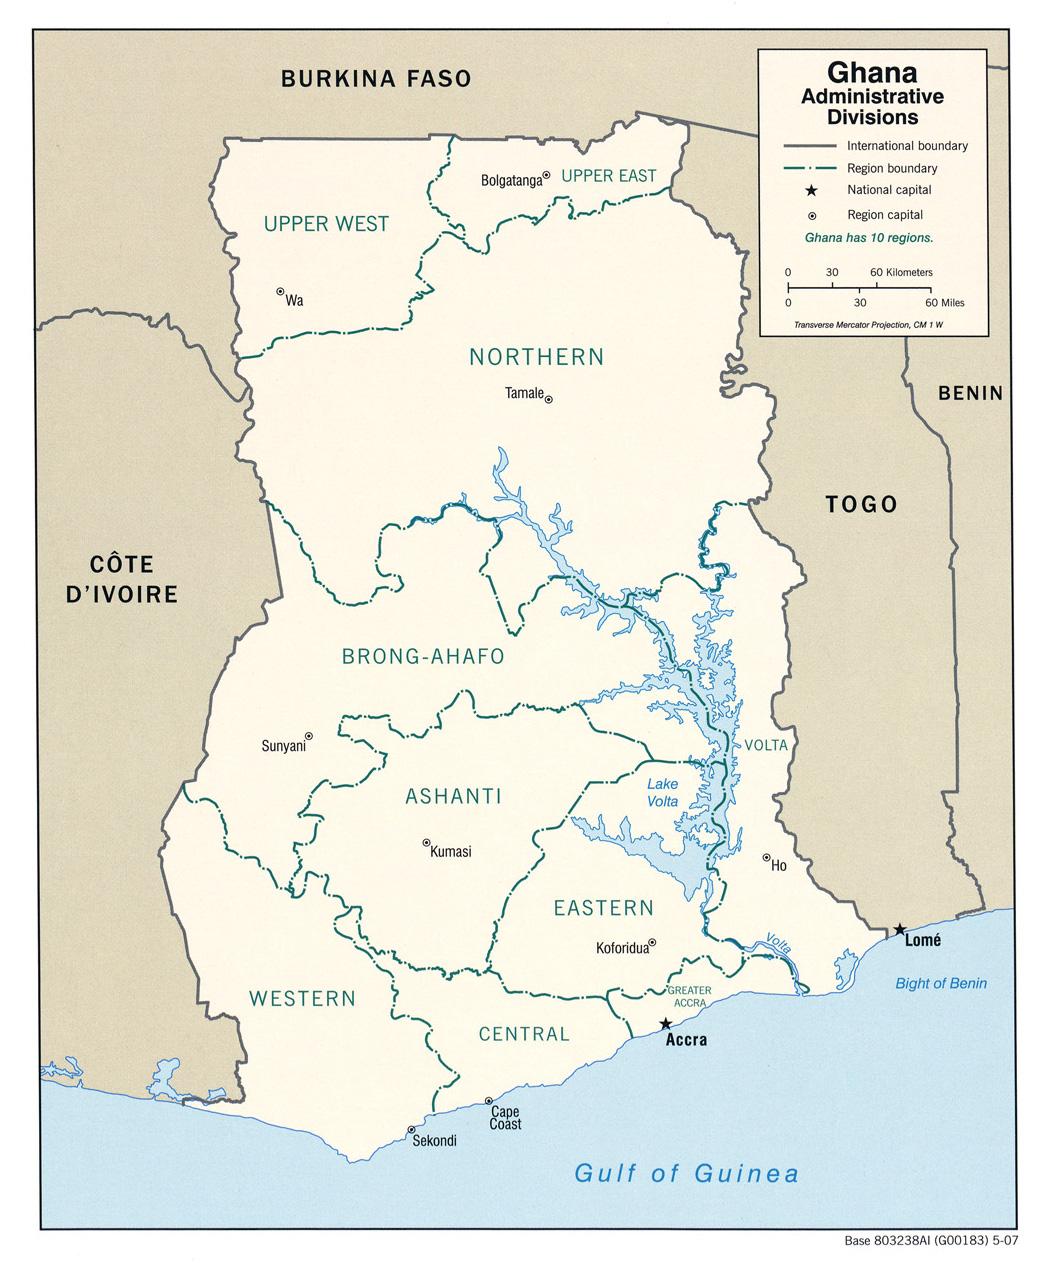 Map of Ghana (Regions) : Weltkarte.com - Karten und ...